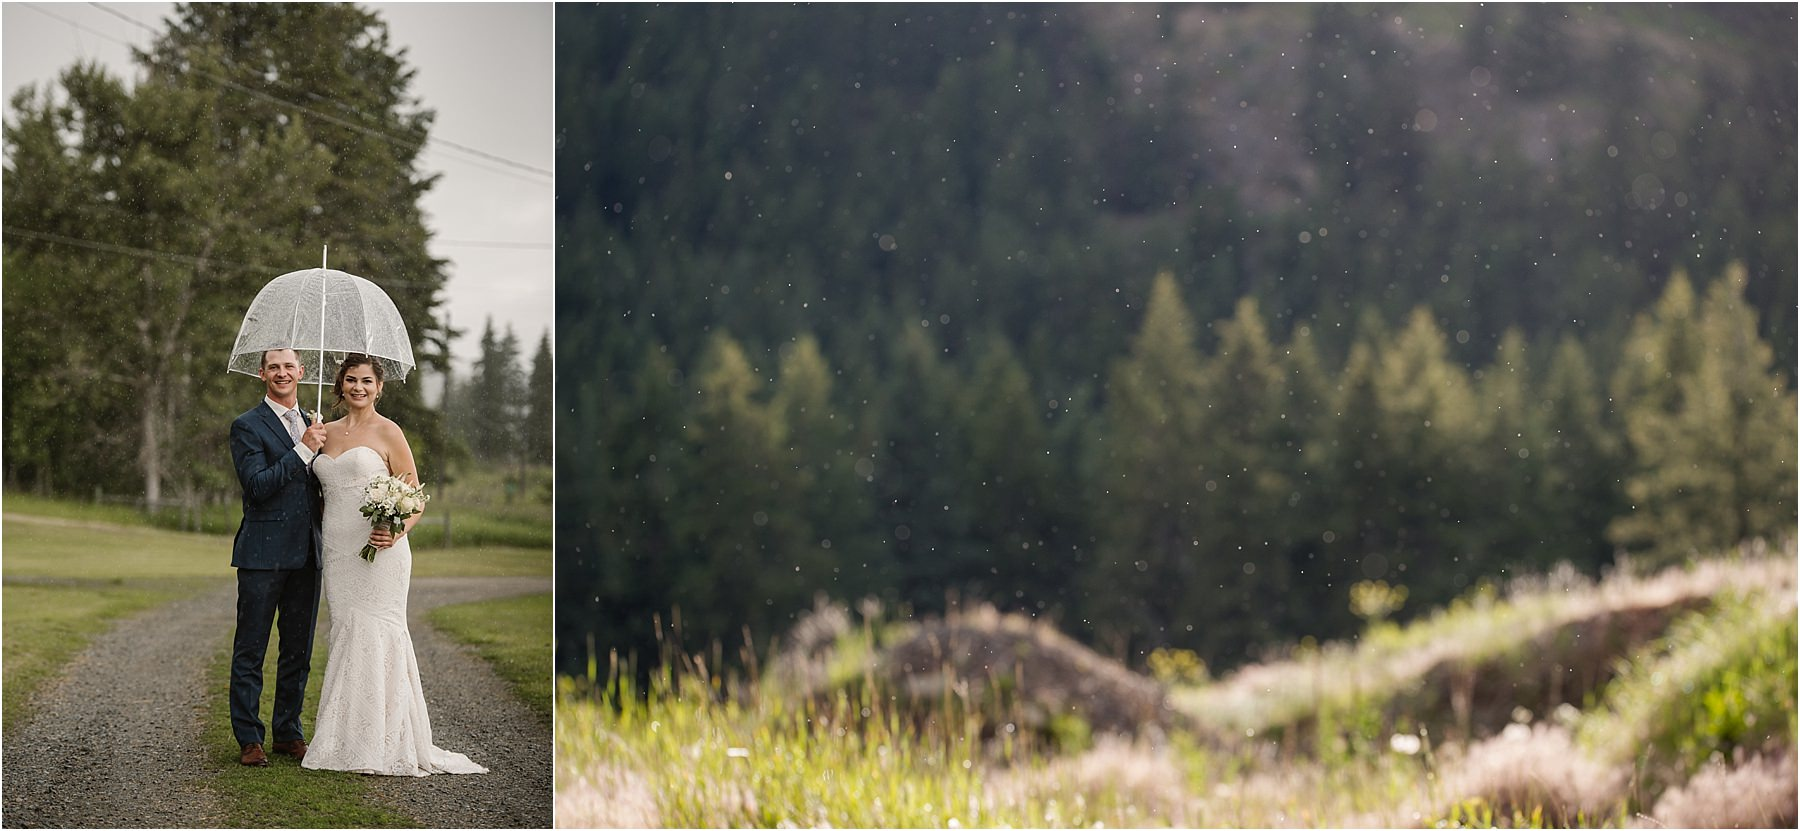 rainy Barriere BC wedding portrait photographer views bride groom romantic bridal portraits umbrella